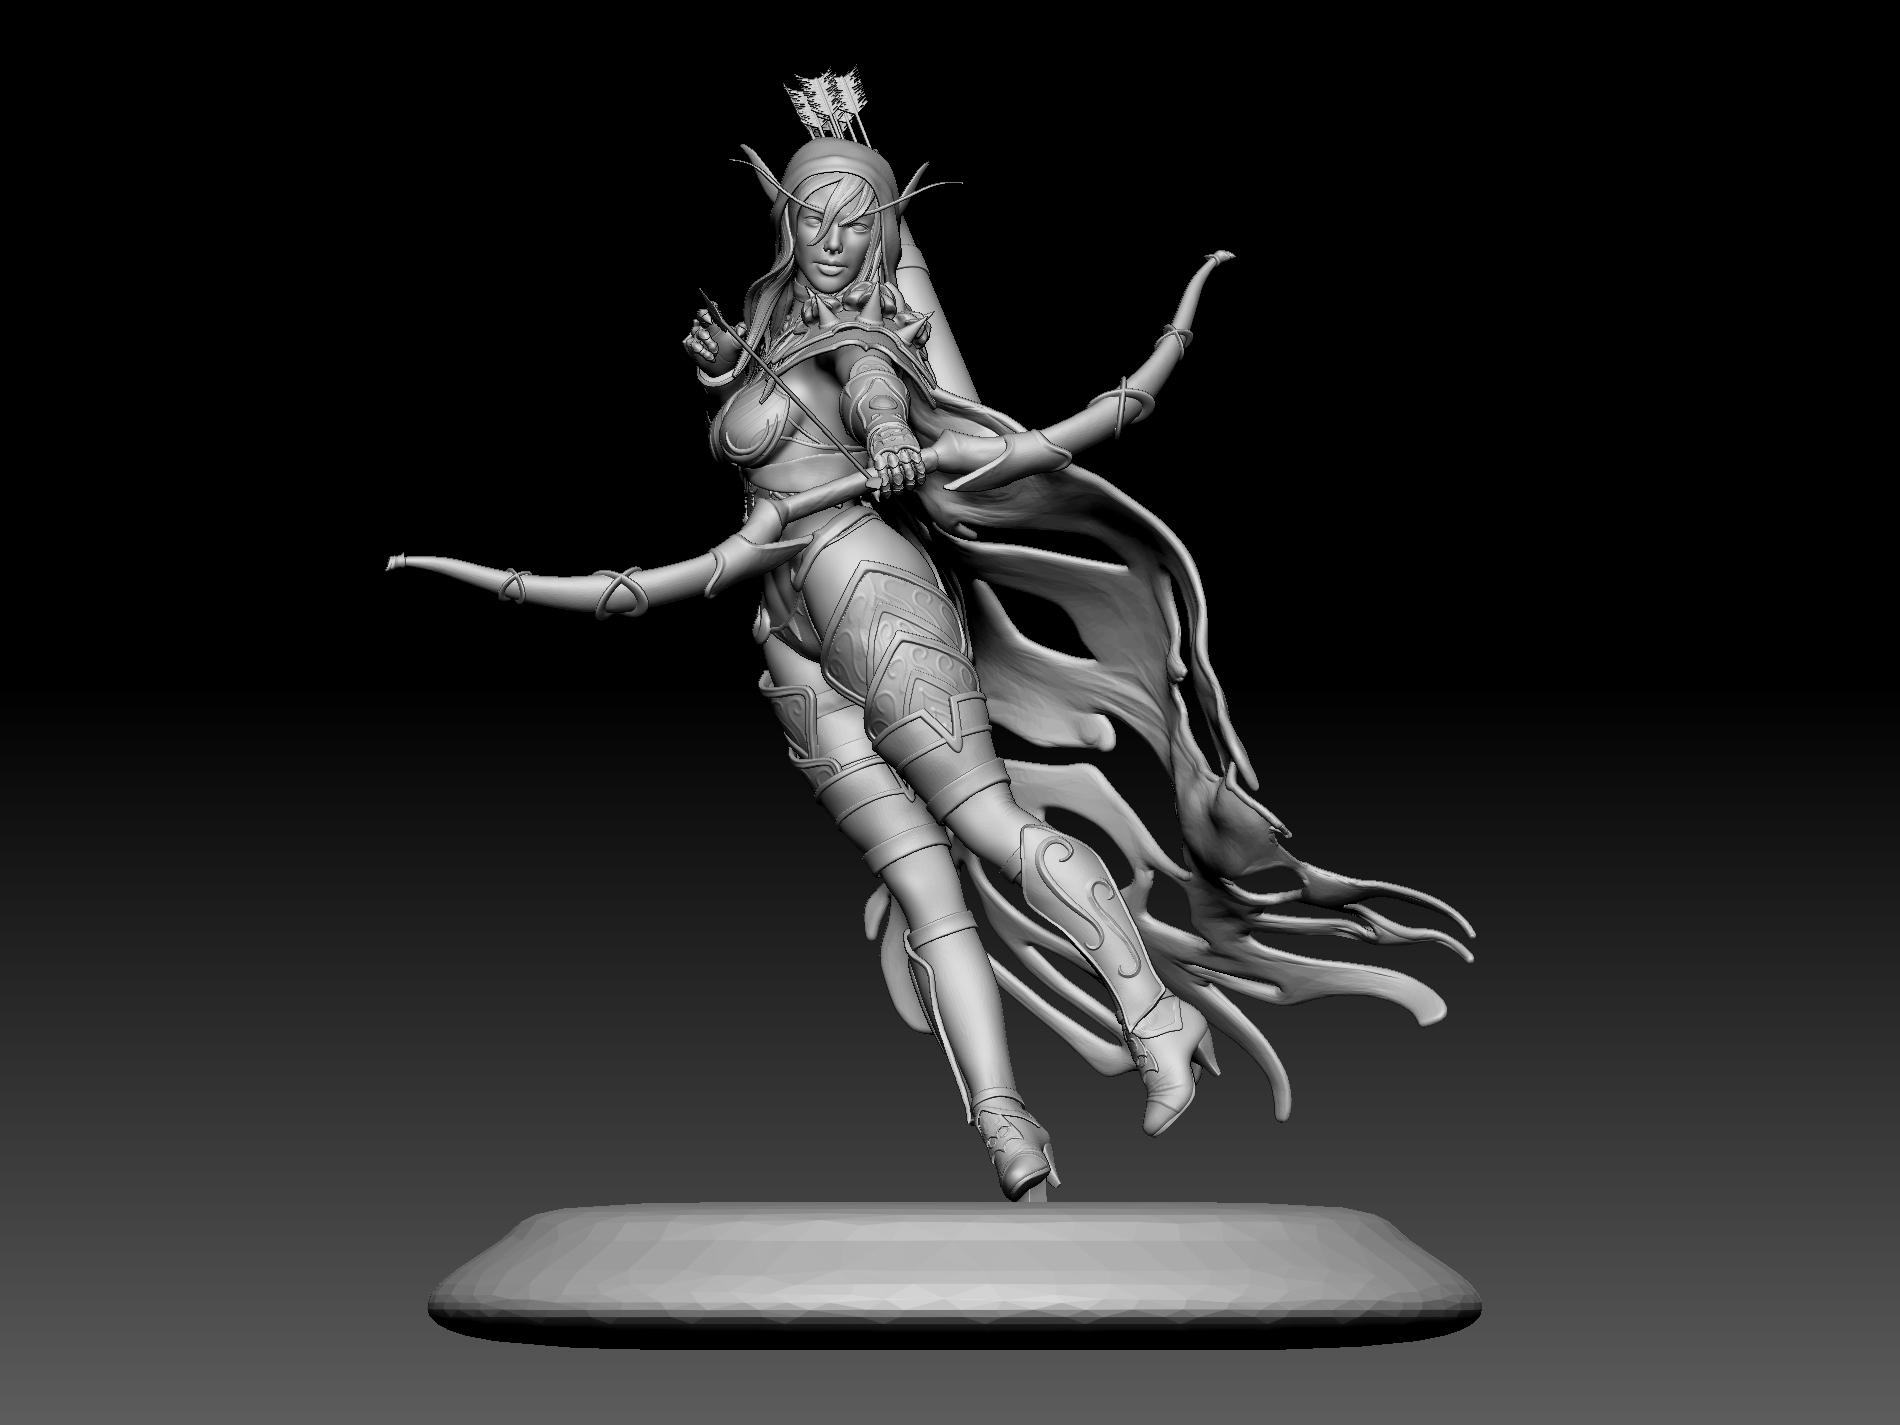 11.jpg Download STL file Sylvanas 3D print • Design to 3D print, mark_nato